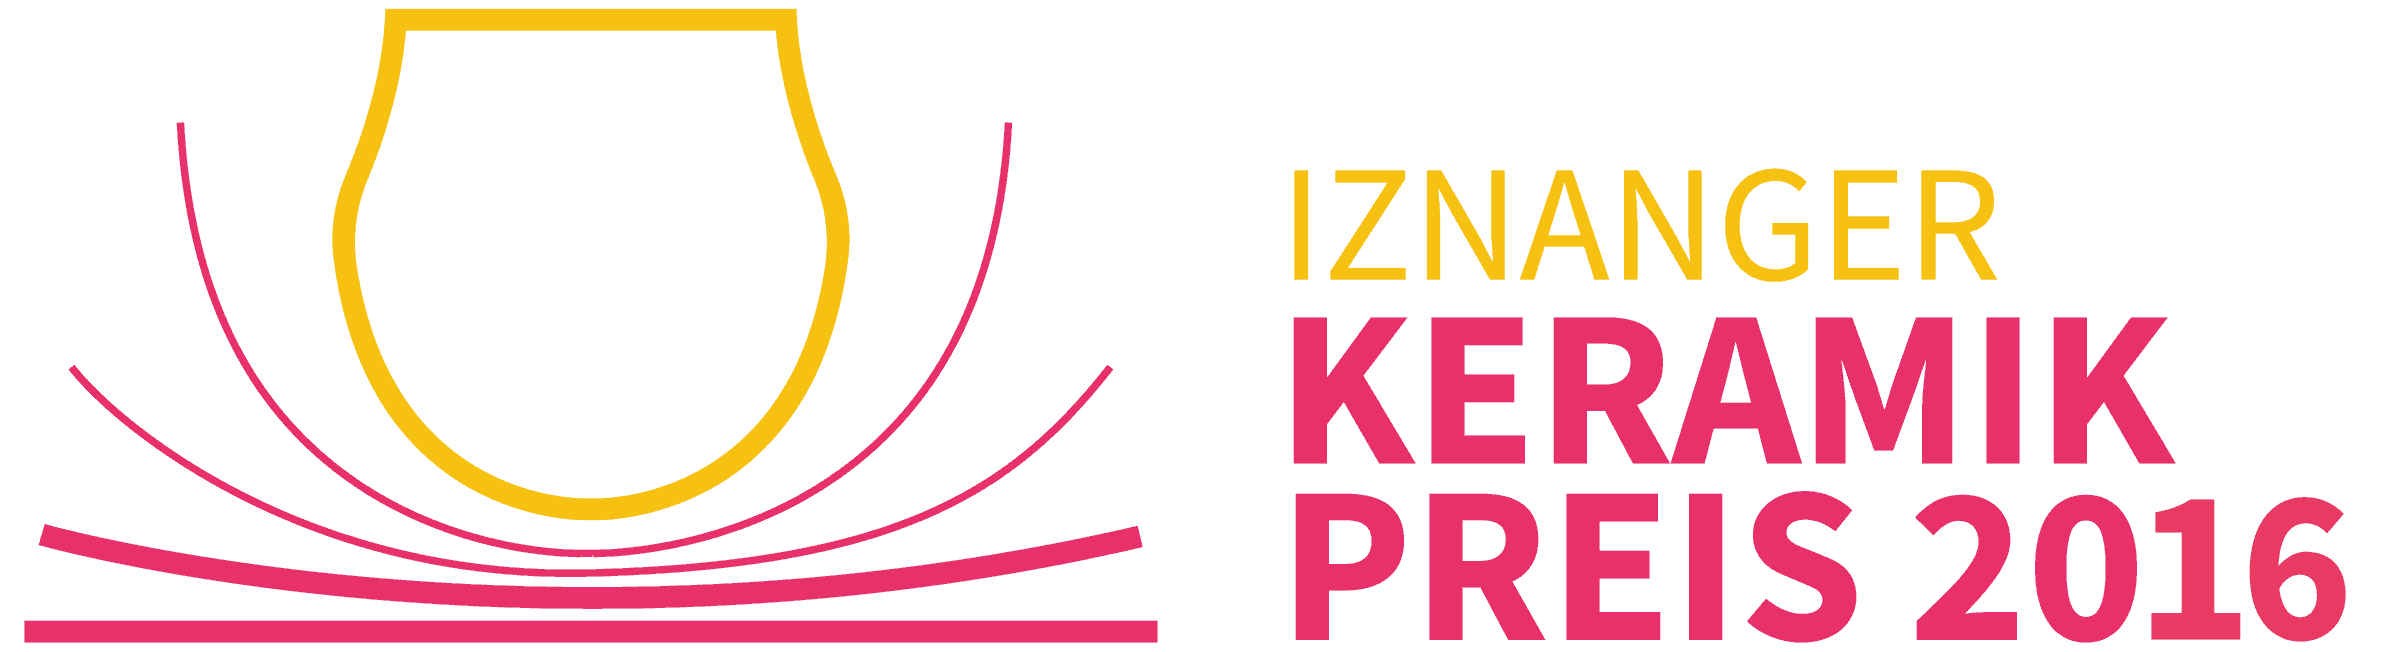 Iznanger-Keramikpreis-2016-logo